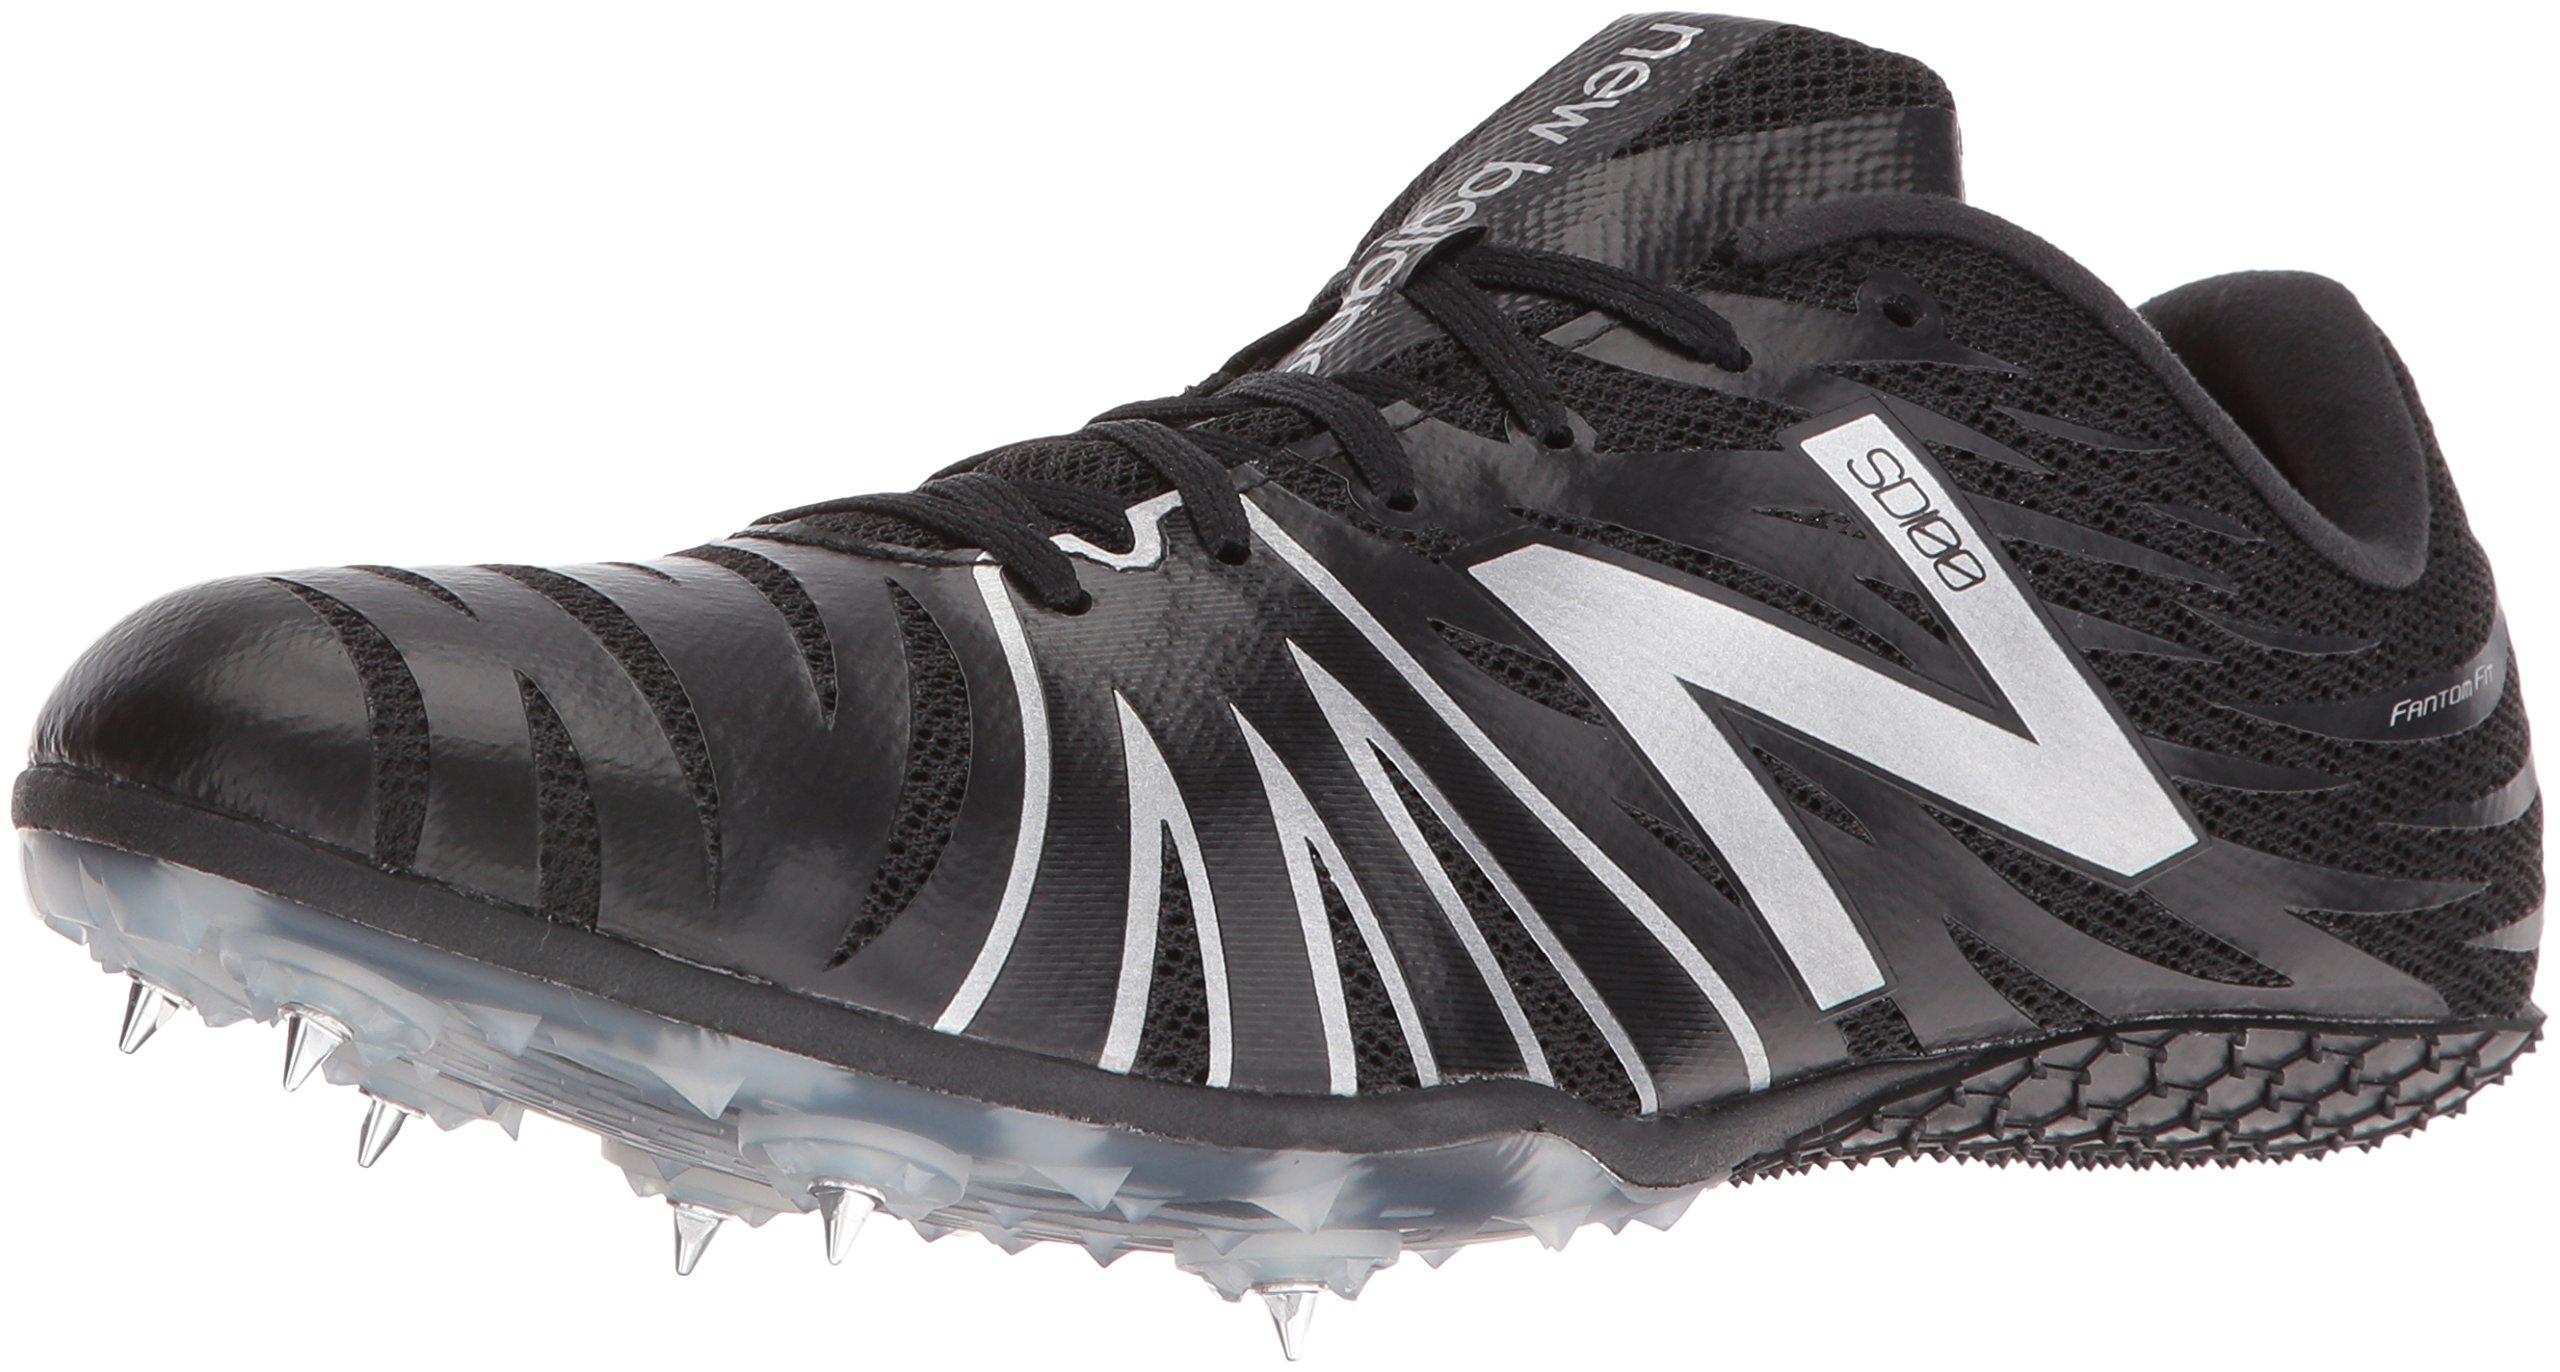 New Balance Men's USD100V1 Track Shoes, Black/Silver, 10 D US